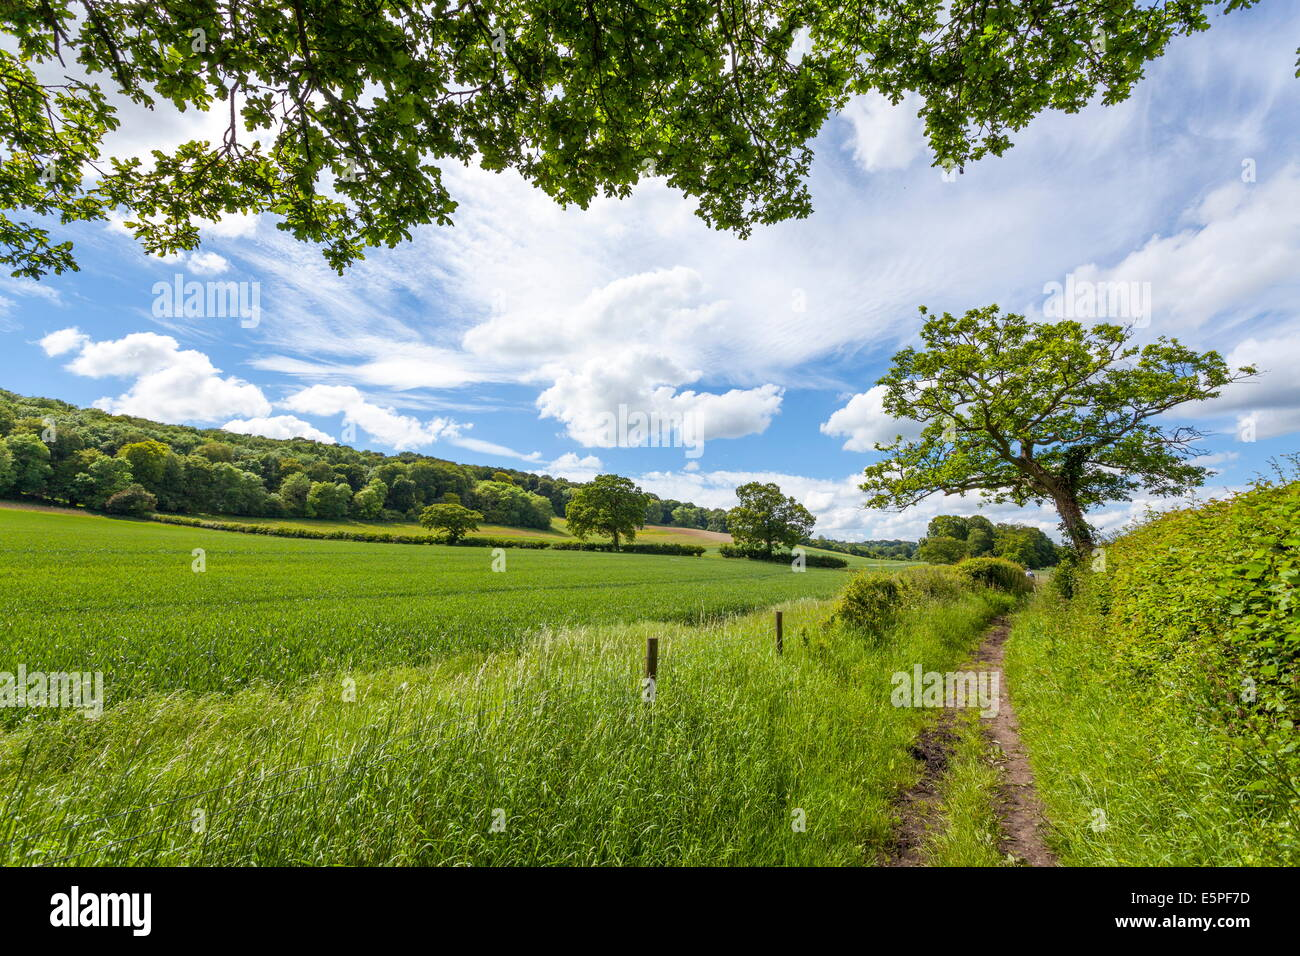 A beautiful day along the Chiltern Walk, The Chilterns, Buckinghamshire, England, United Kingdom, Europe - Stock Image